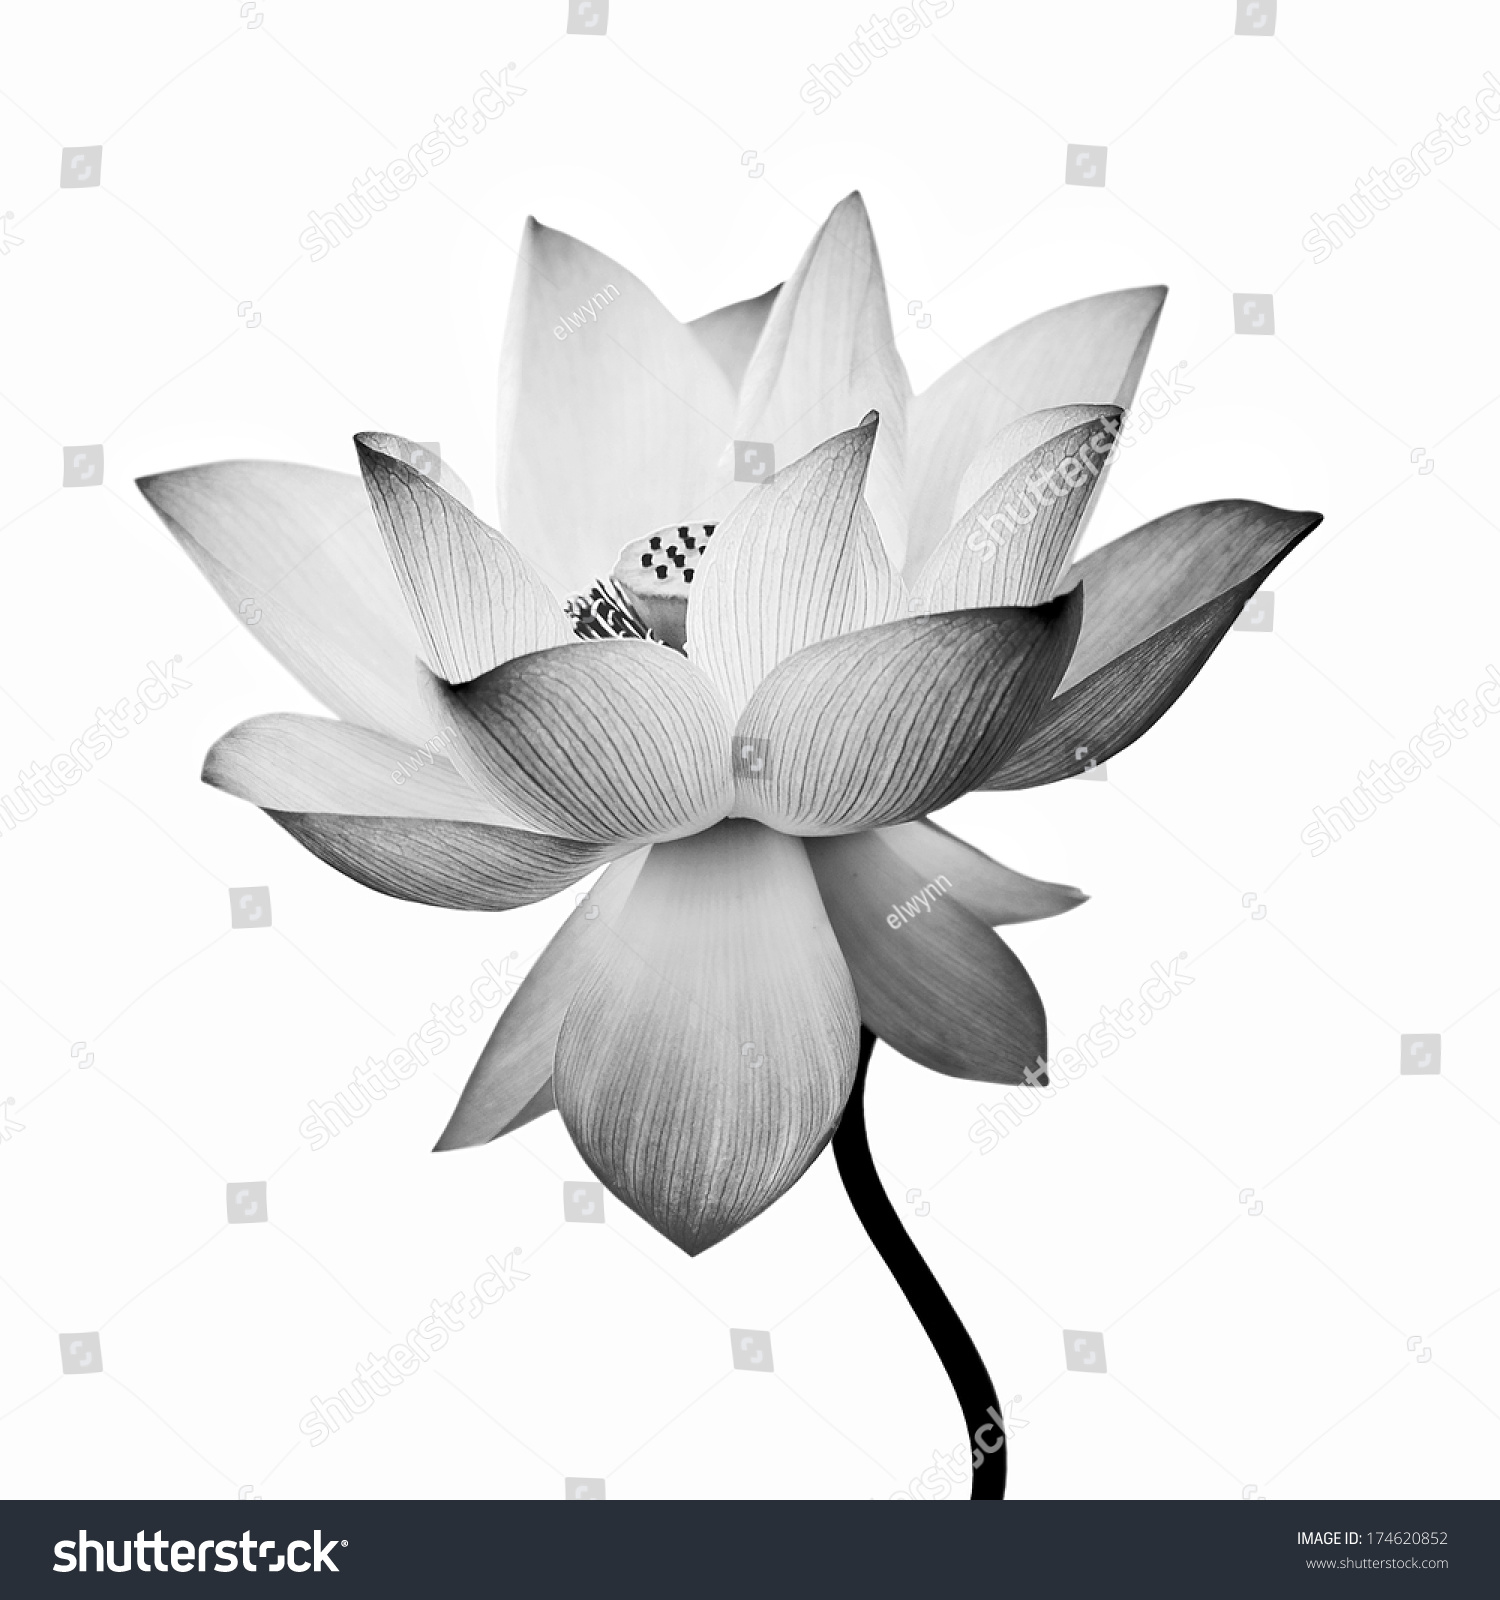 Lotus flower isolated on white background stock photo 174620852 lotus flower isolated on white background izmirmasajfo